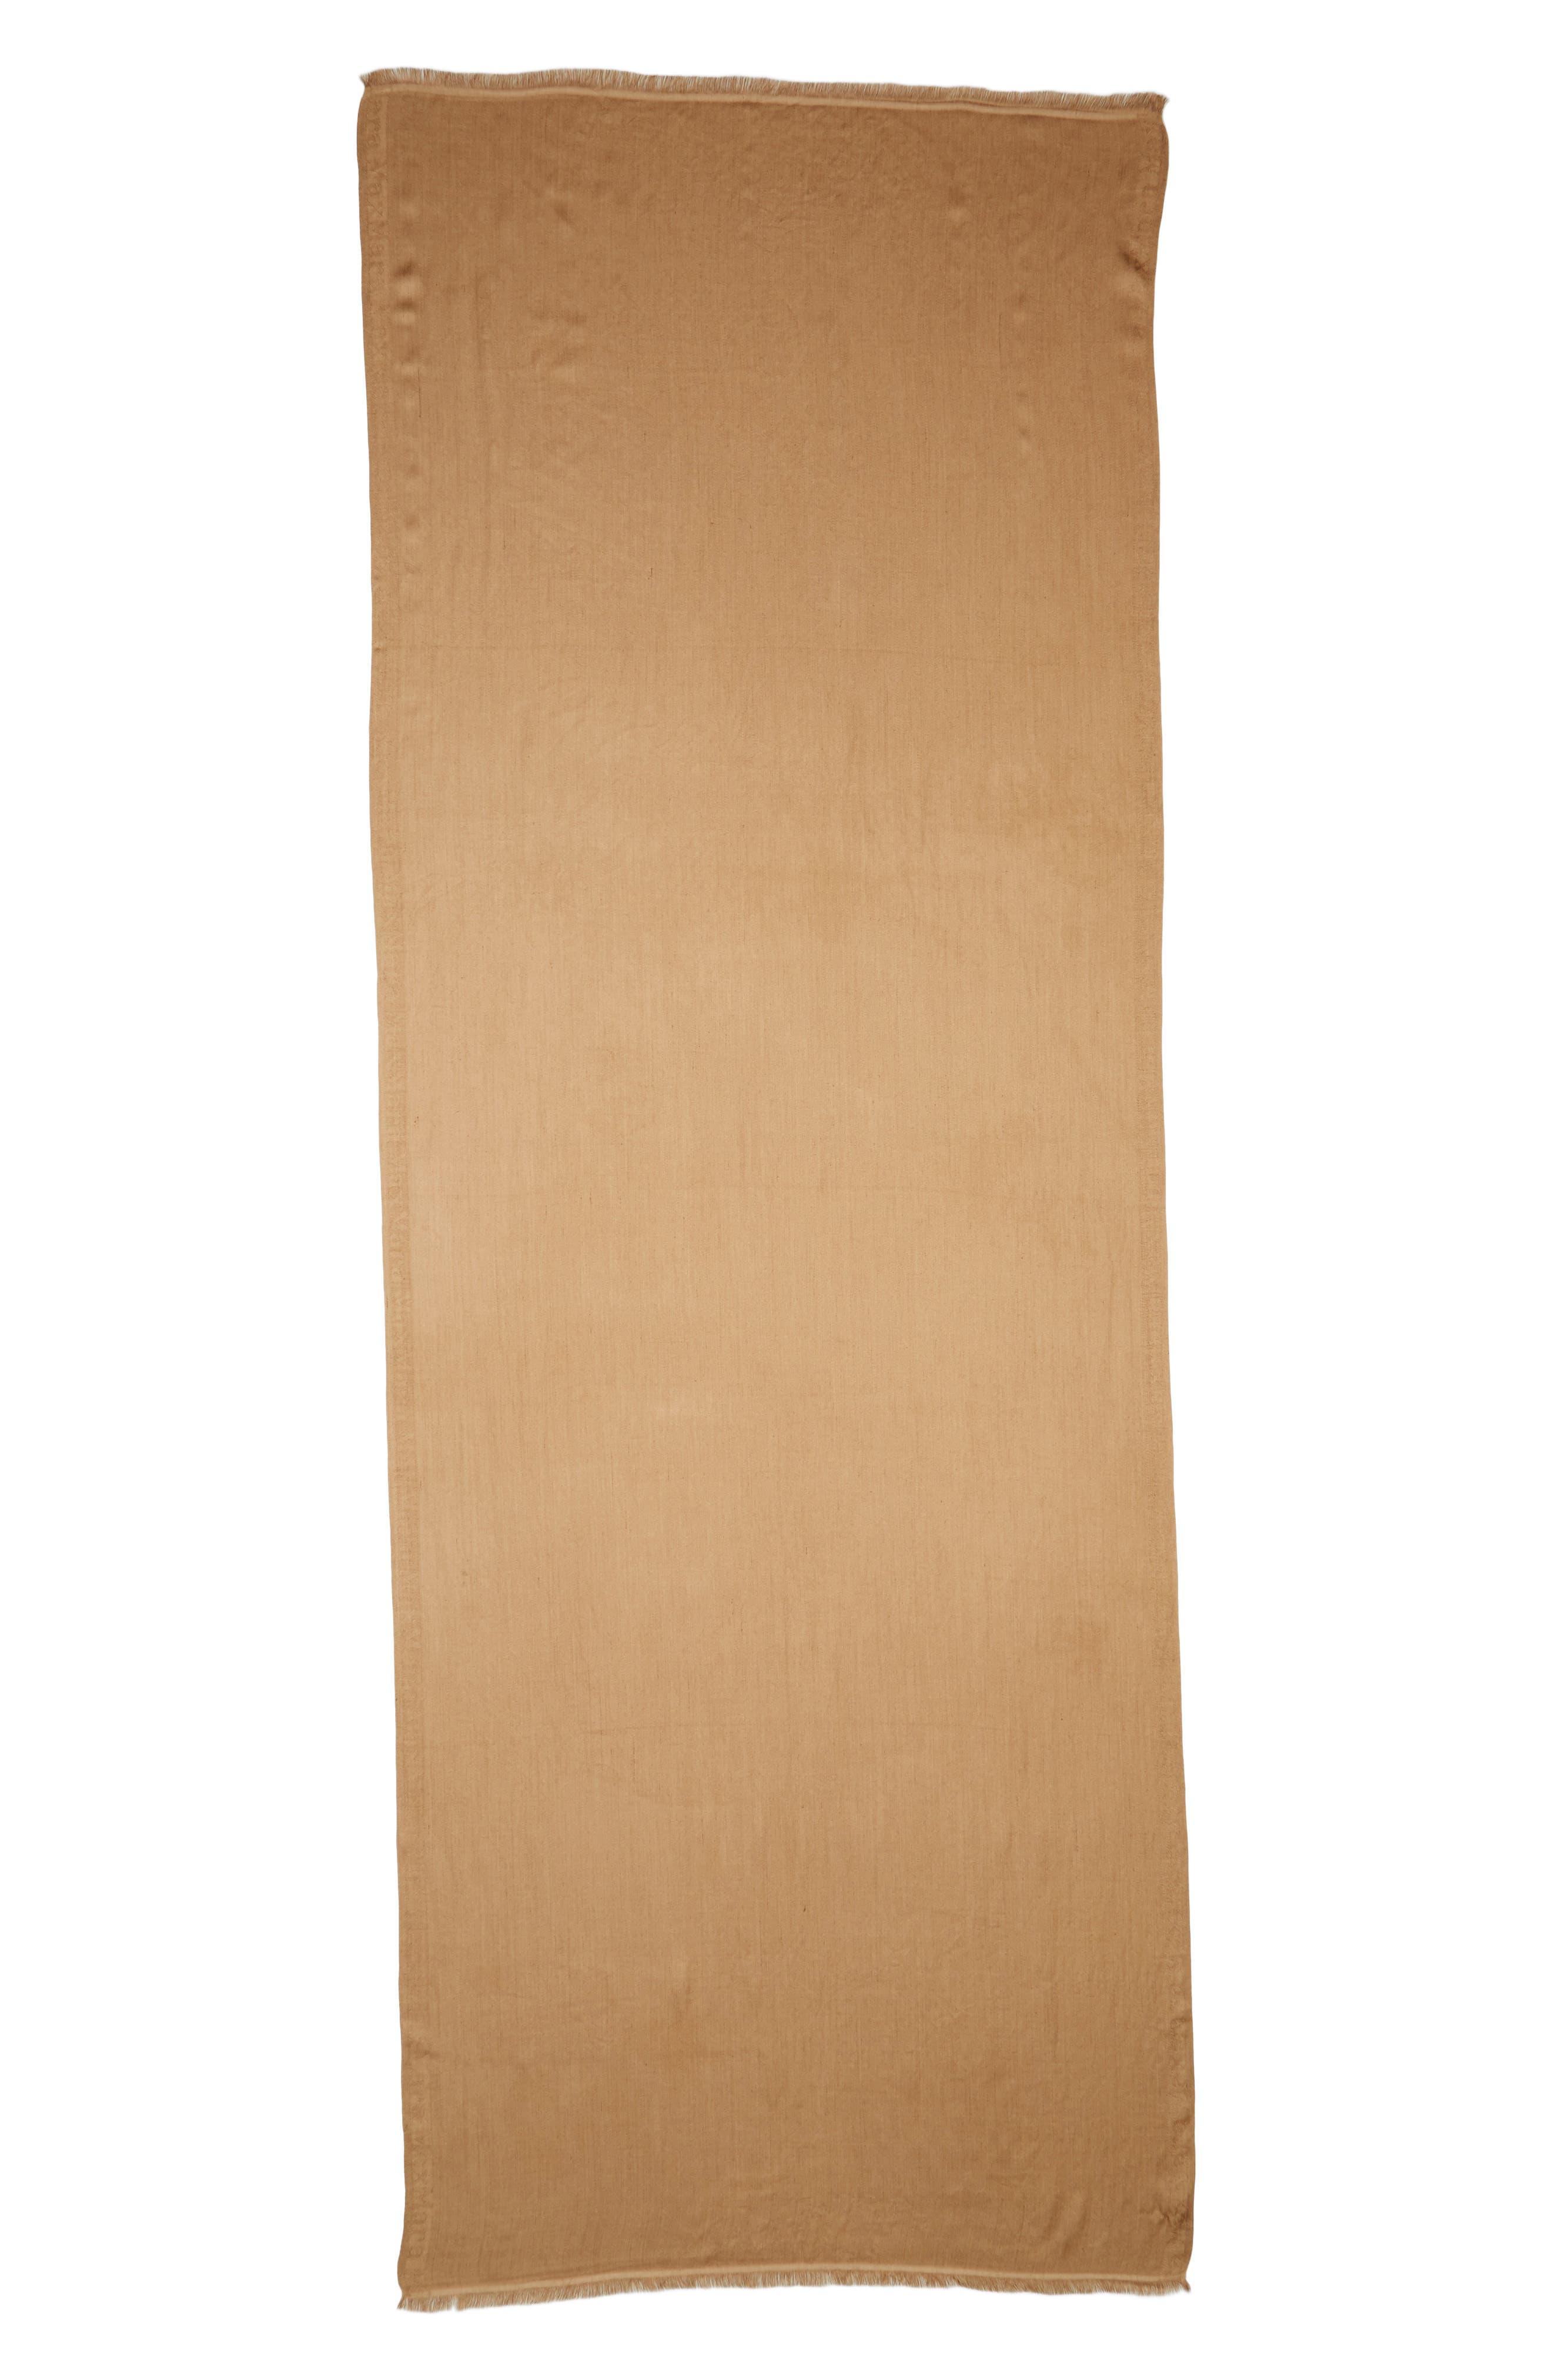 Upupa Silk Scarf,                         Main,                         color, 232